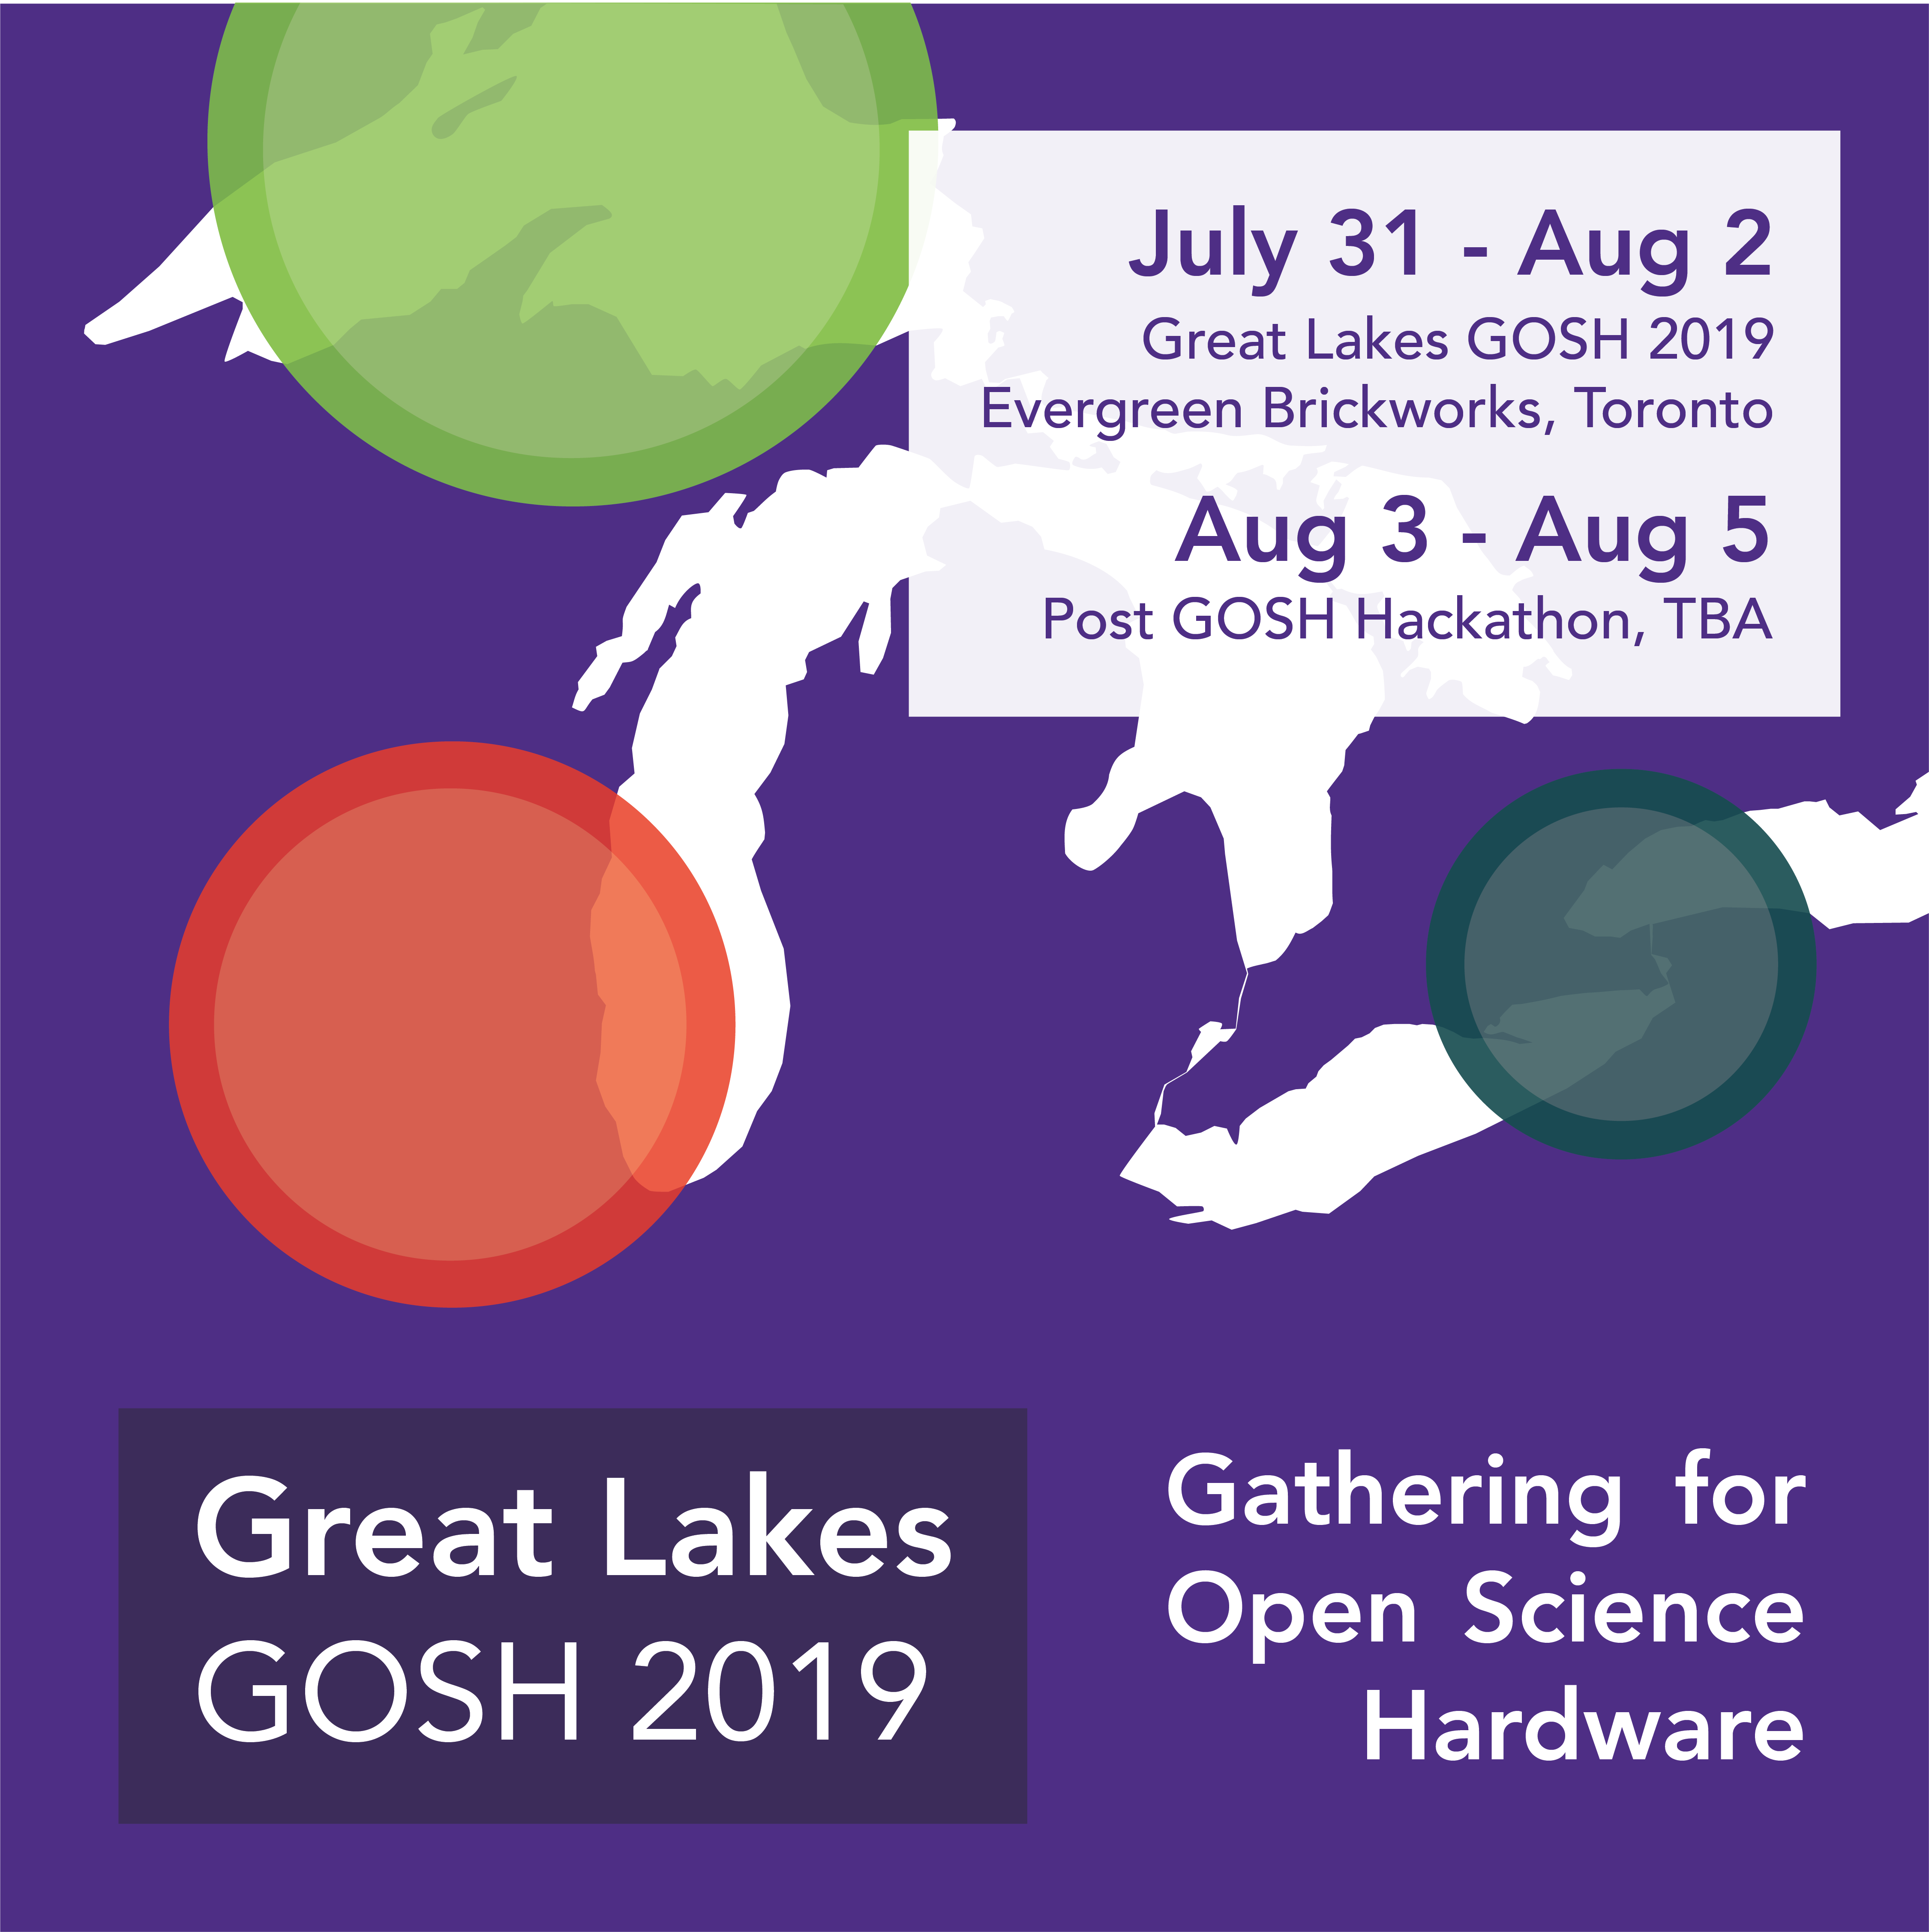 Great Lakes GOSH 2019